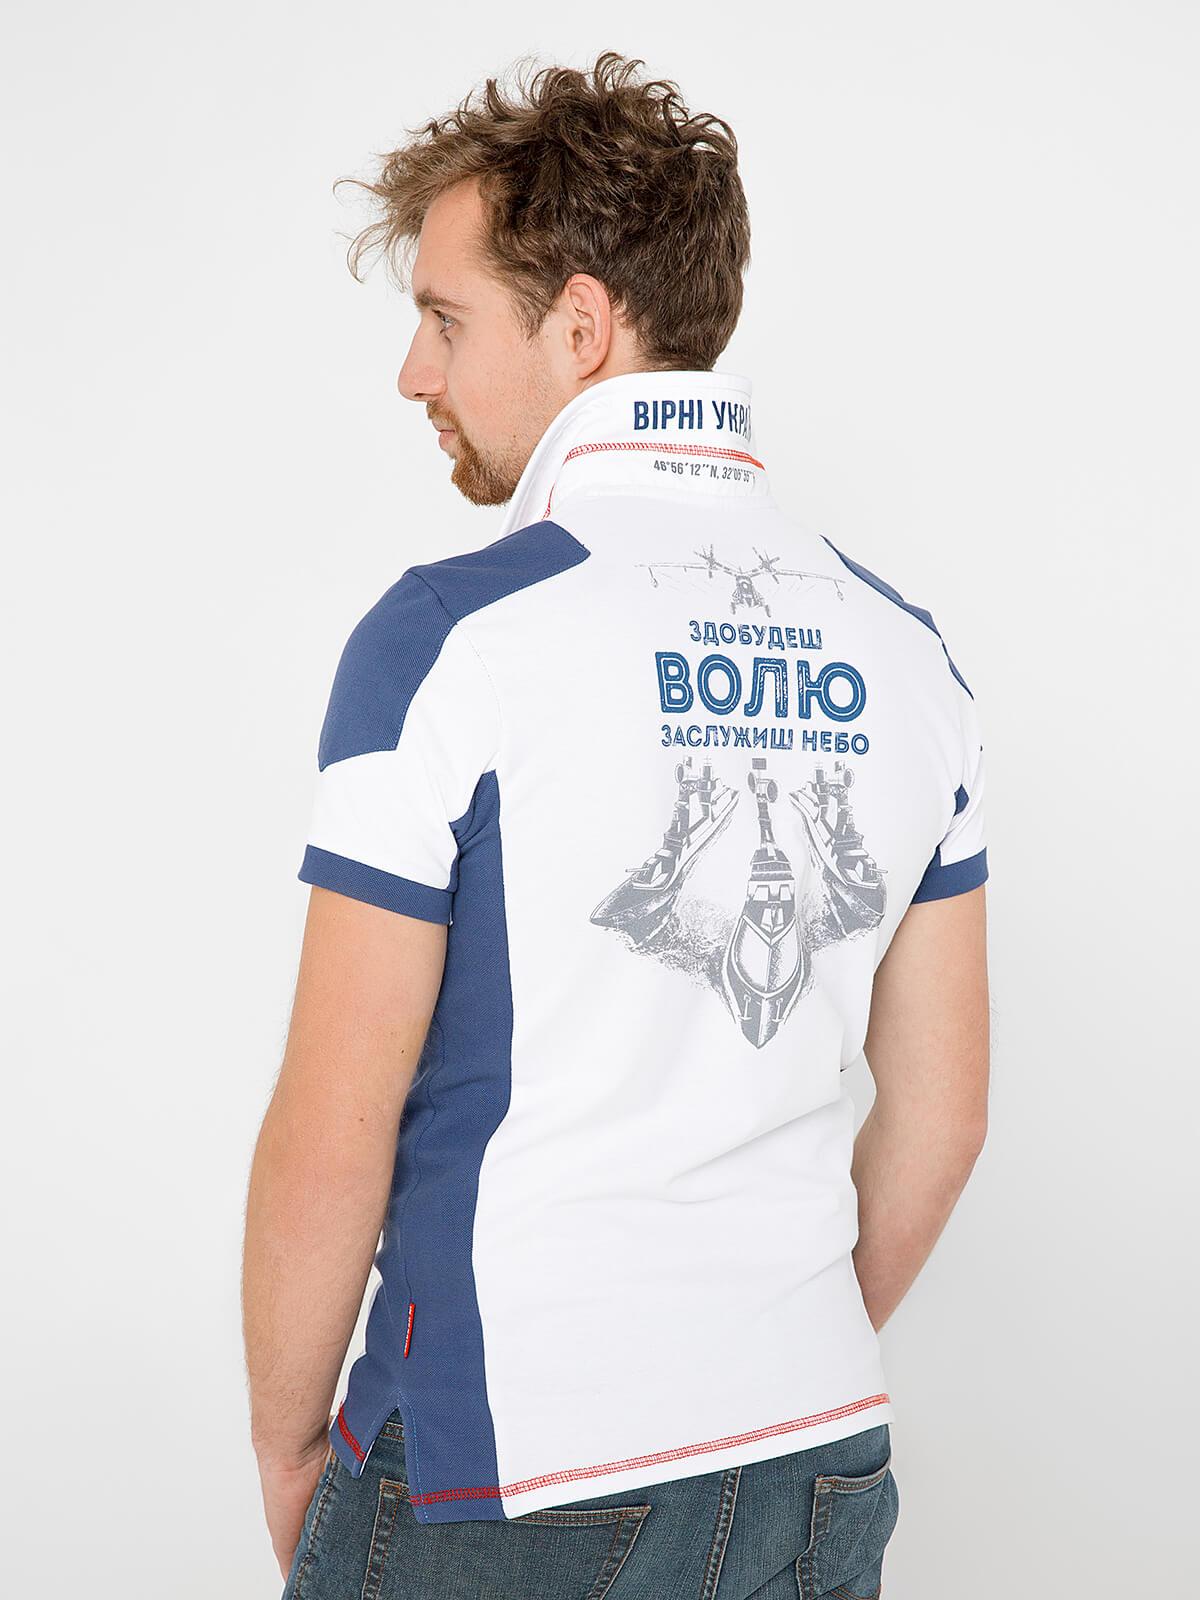 Men's Polo Shirt 10 Brigade. Color white.  Technique of prints applied: embroidery, silkscreen printing.